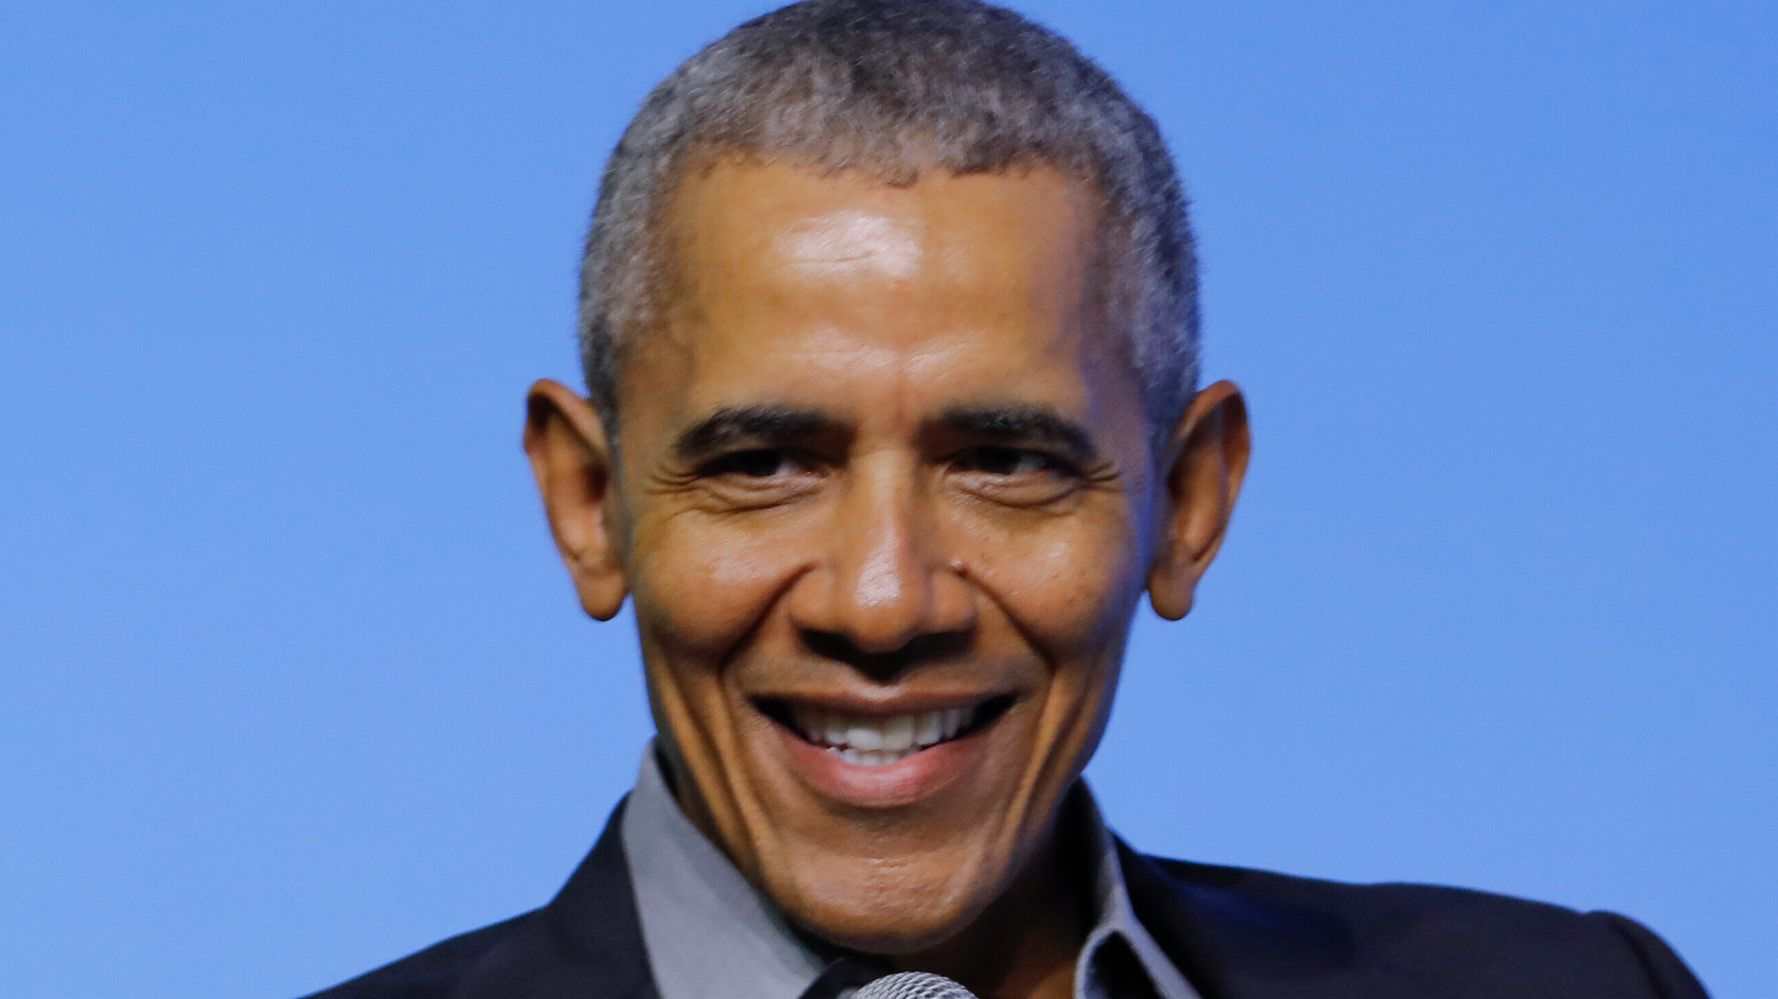 Westlake Legal Group 5e3e80a6220000ca0e23ec08 Ex-Obama Photographer Highlights Trump's Vindictiveness With Old Prank Snap